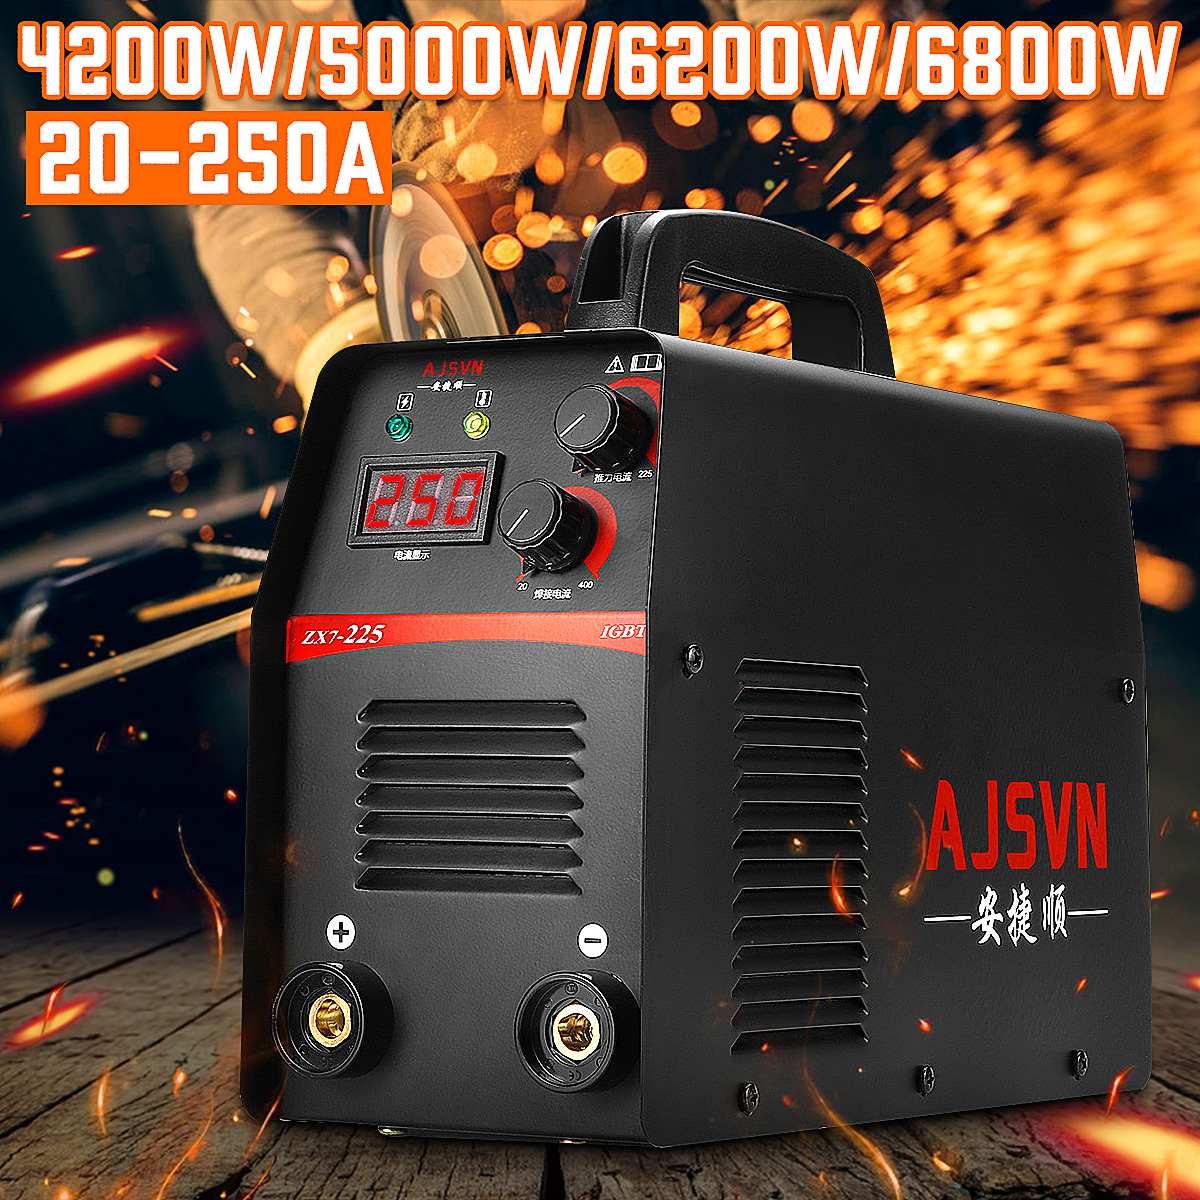 4200/5000/6200/6800W Inverter Arc Electric Welding Machine 4 Type LCD Display Welder Tools for Home DIY Beginner Efficient